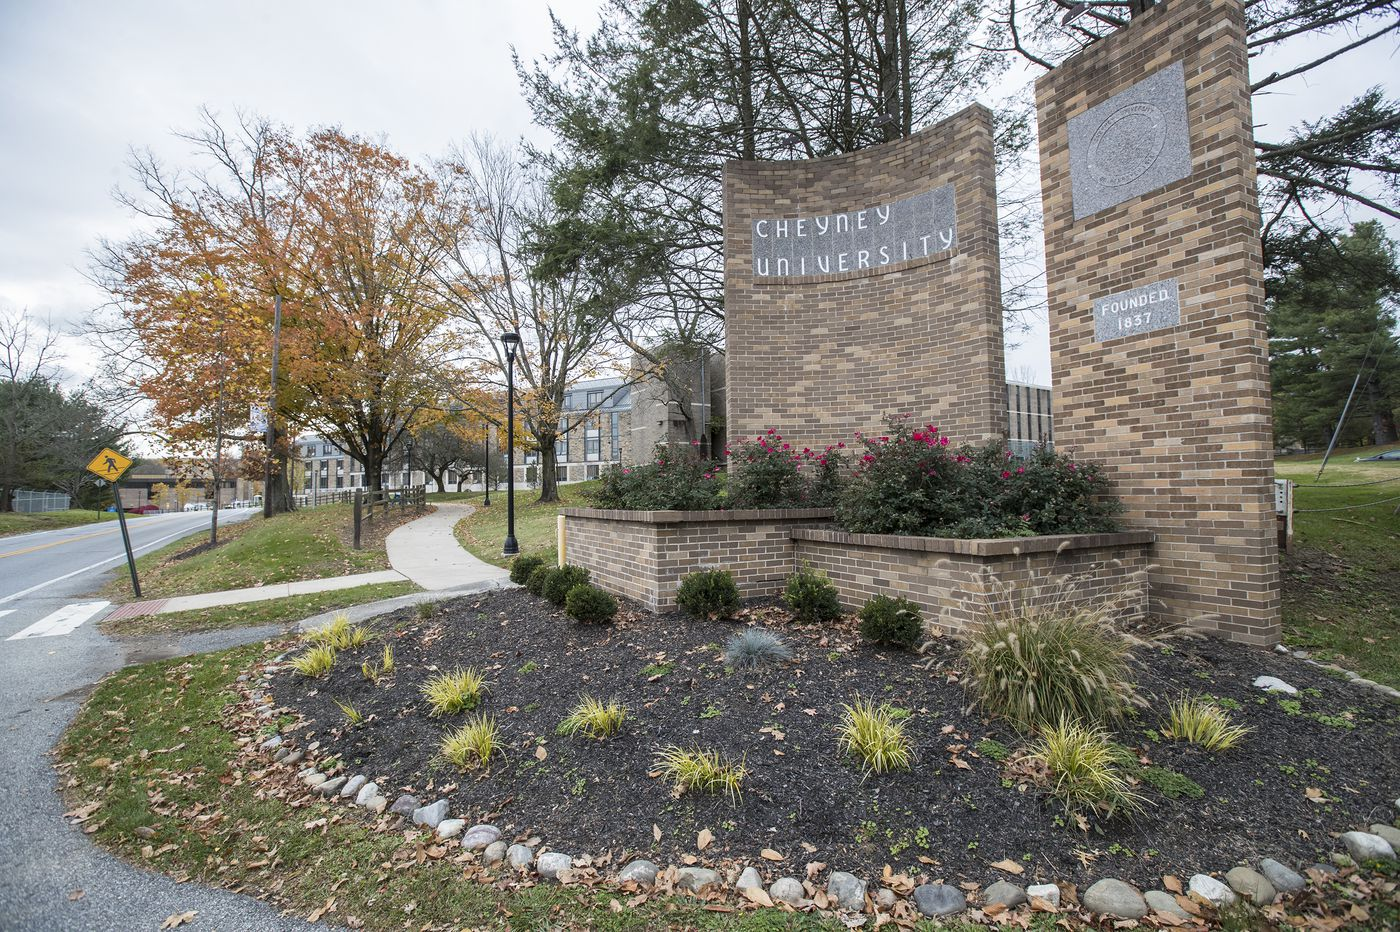 Cheyney enrollment plummets amid broader decline at Pa. state universities